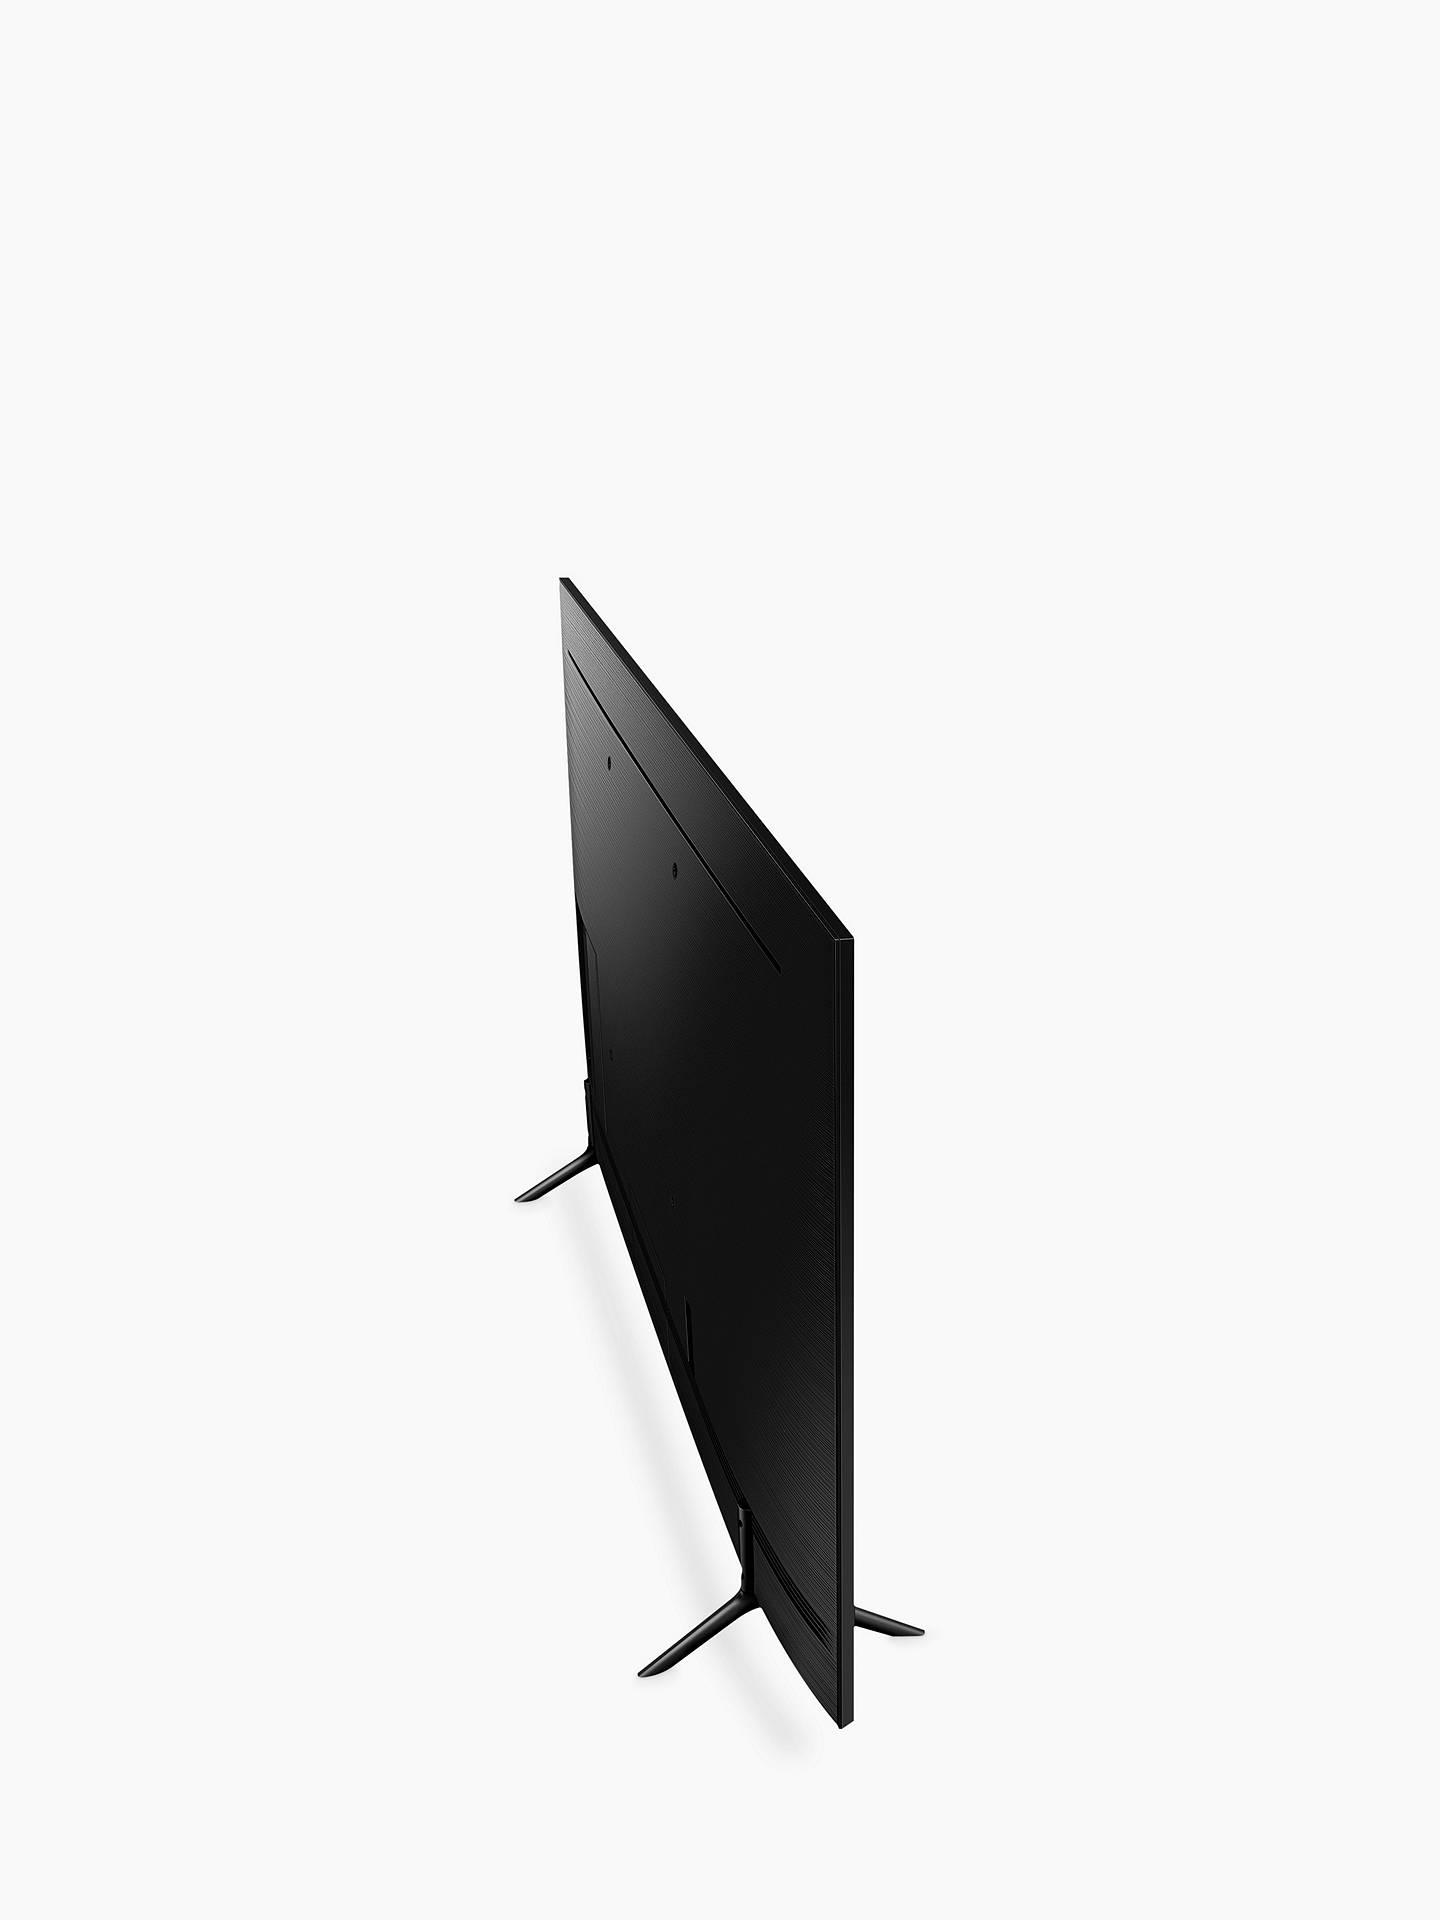 Samsung QE49Q60R (2019) QLED HDR 4K Ultra HD Smart TV, 49